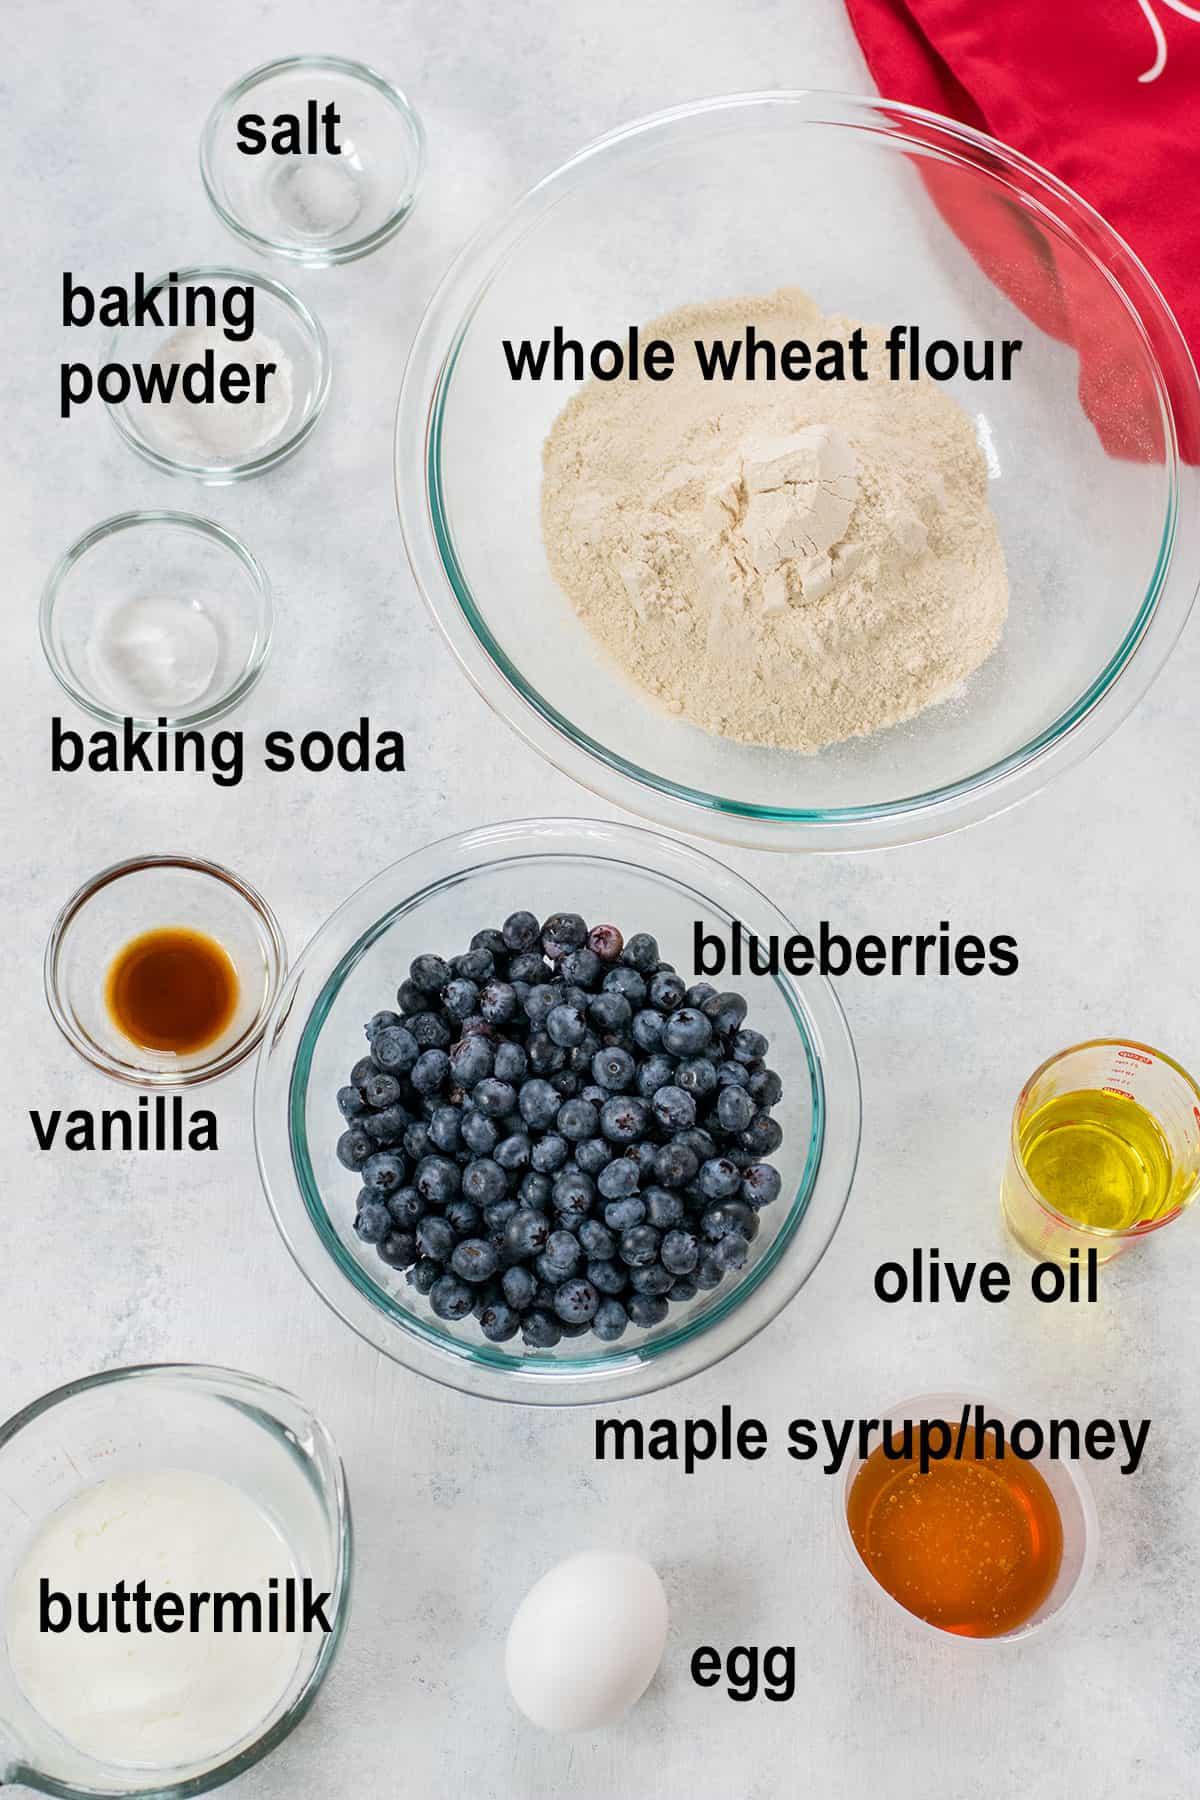 blueberries, flour, oil, egg, milk and ingredients